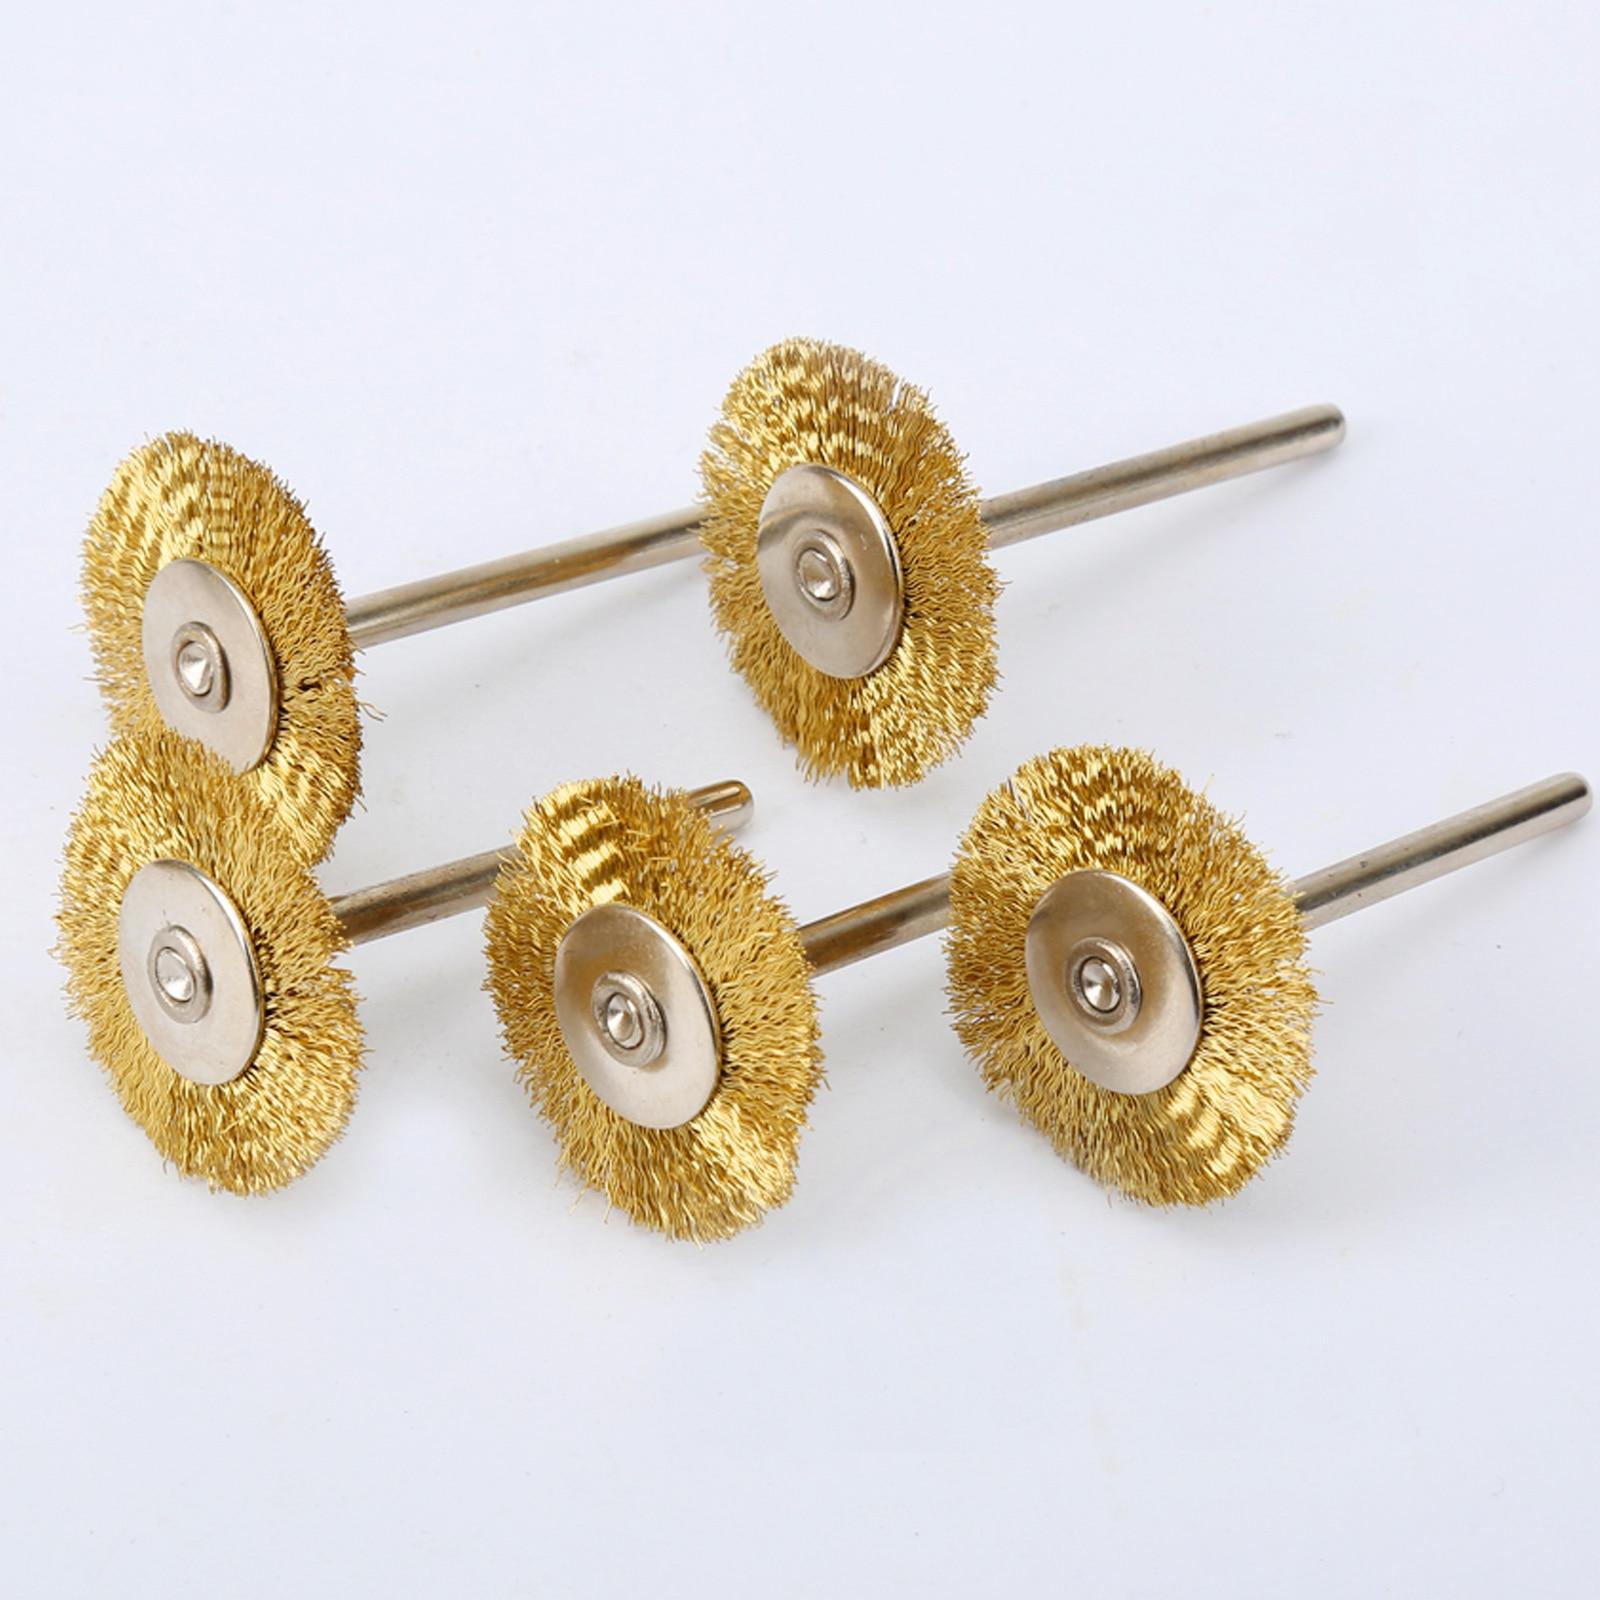 2.35mm Shank Drilling Sanding Grinding Polishing Mandrel Rotary Tool 5pcs